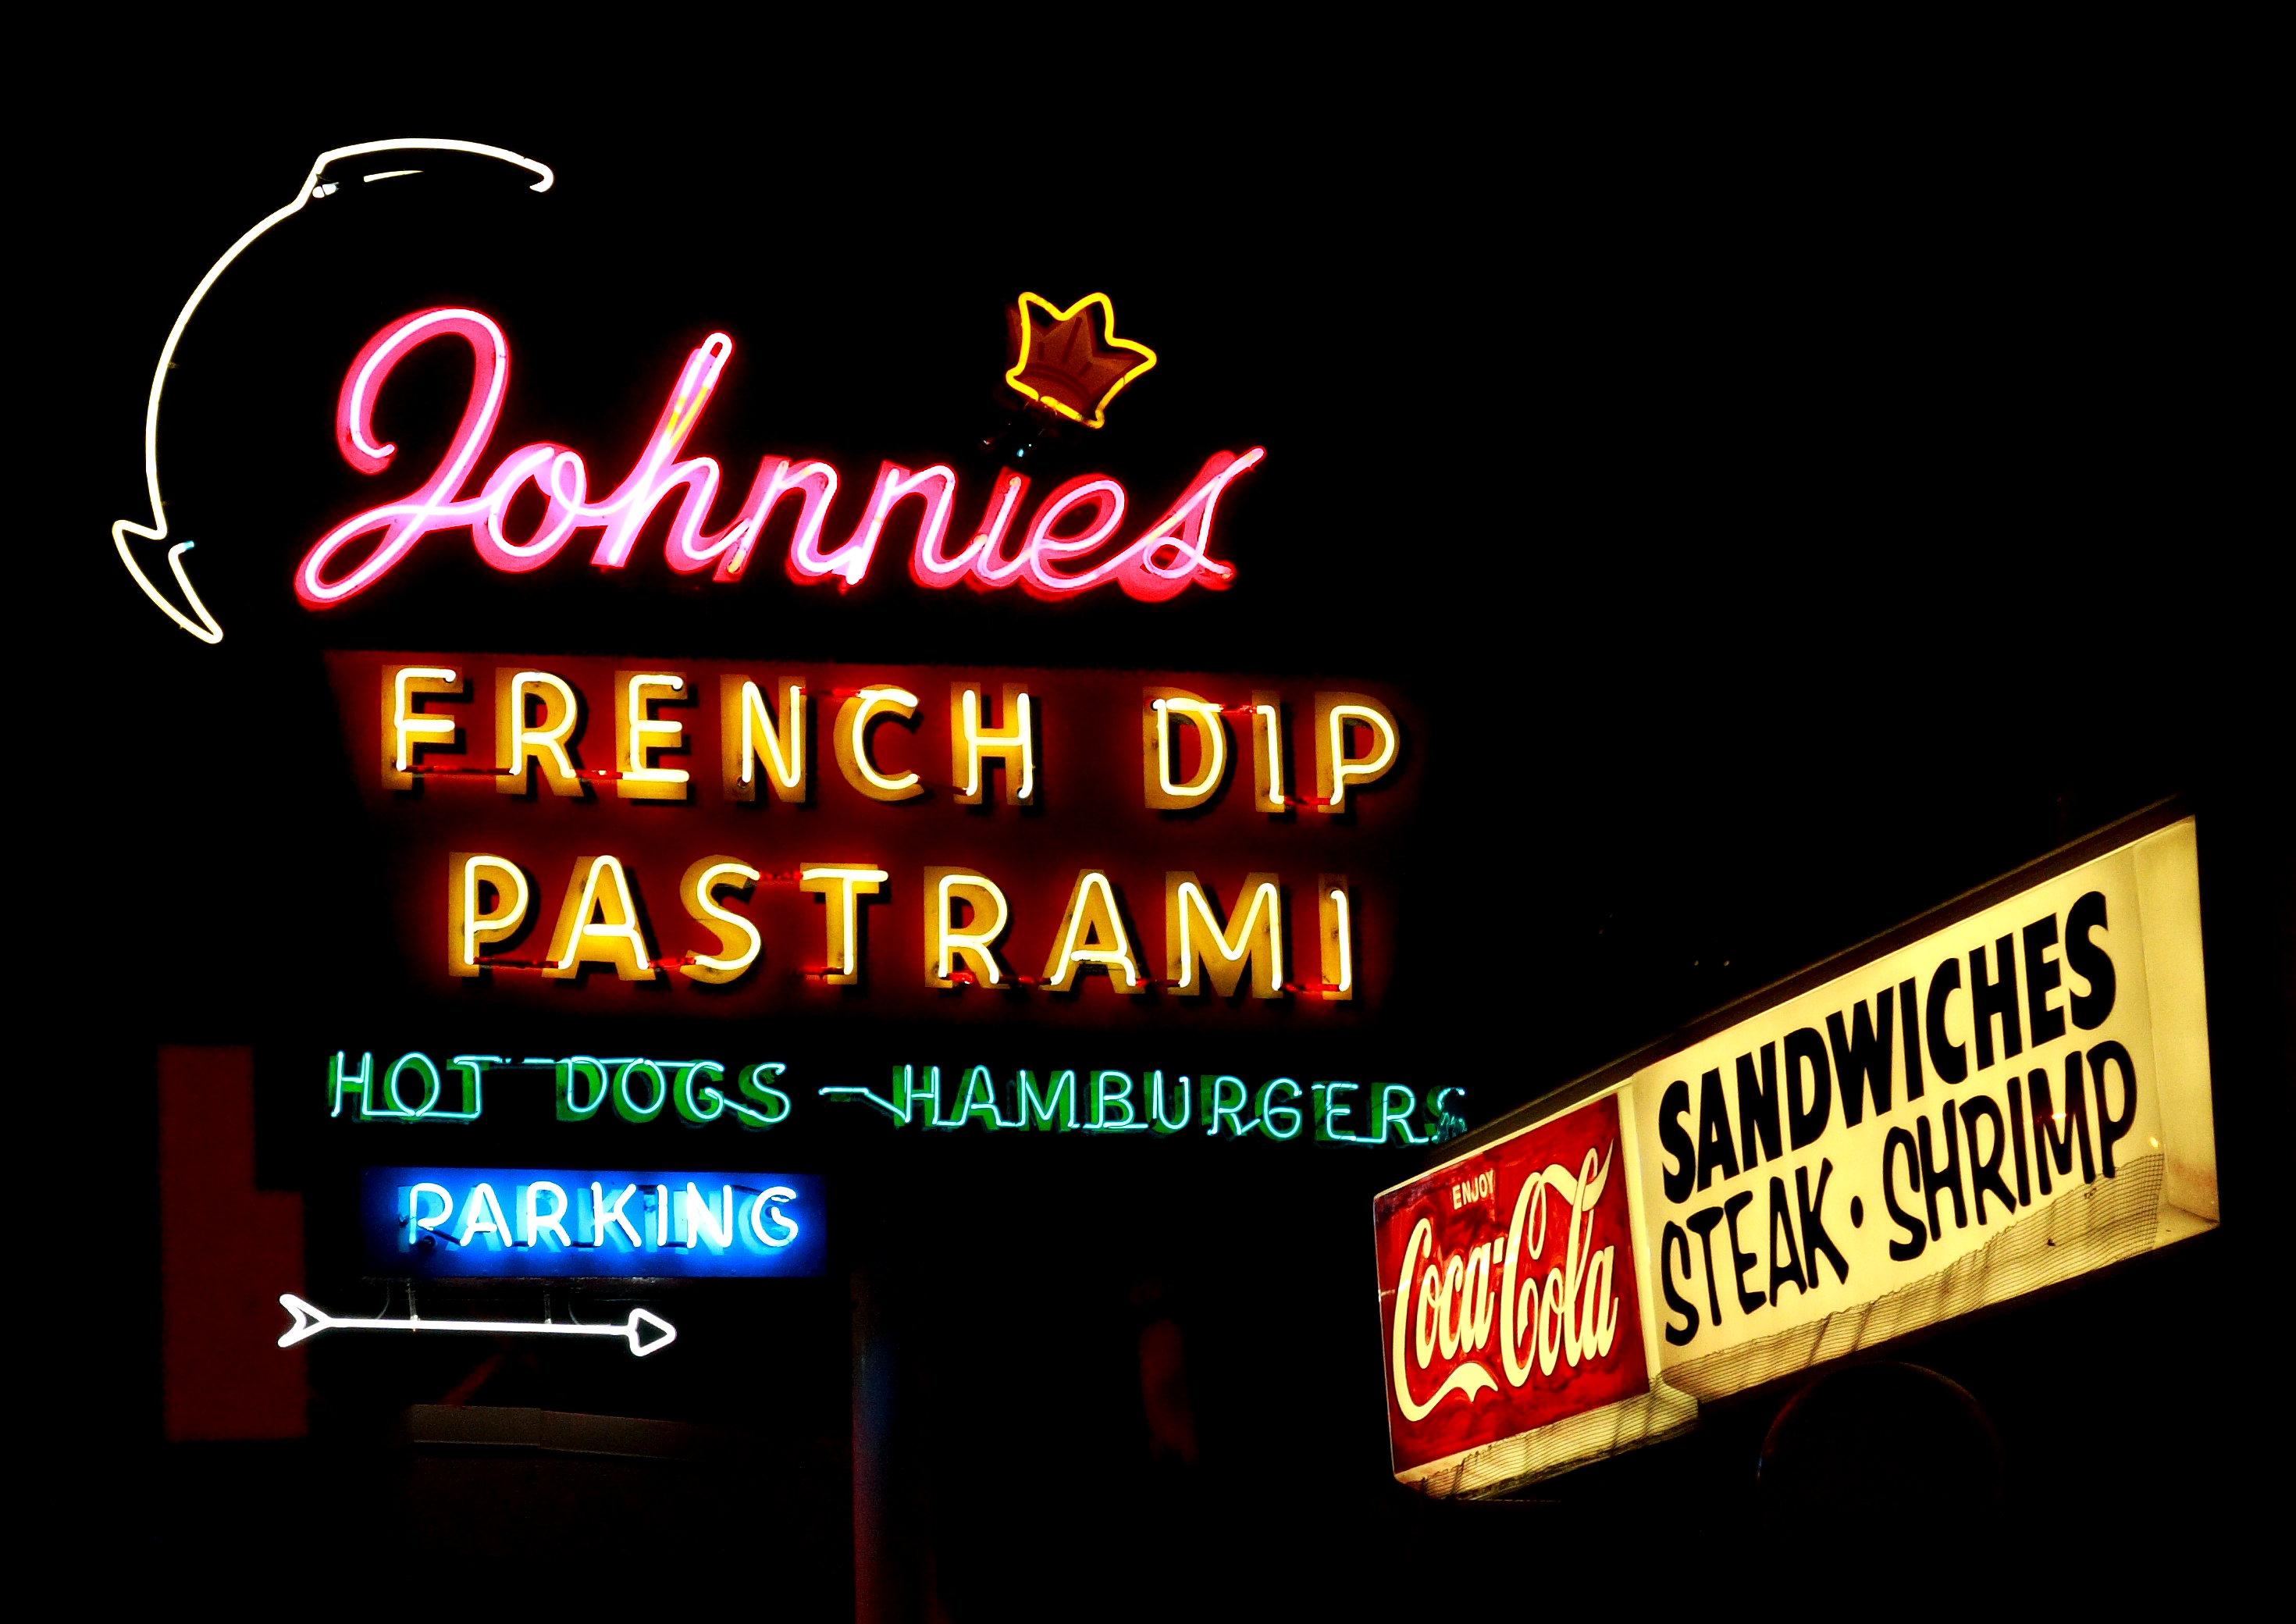 Johnnie's Pastrami - 4017 South Sepulveda Boulevard, Culver City, California U.S.A. - April 12, 2008